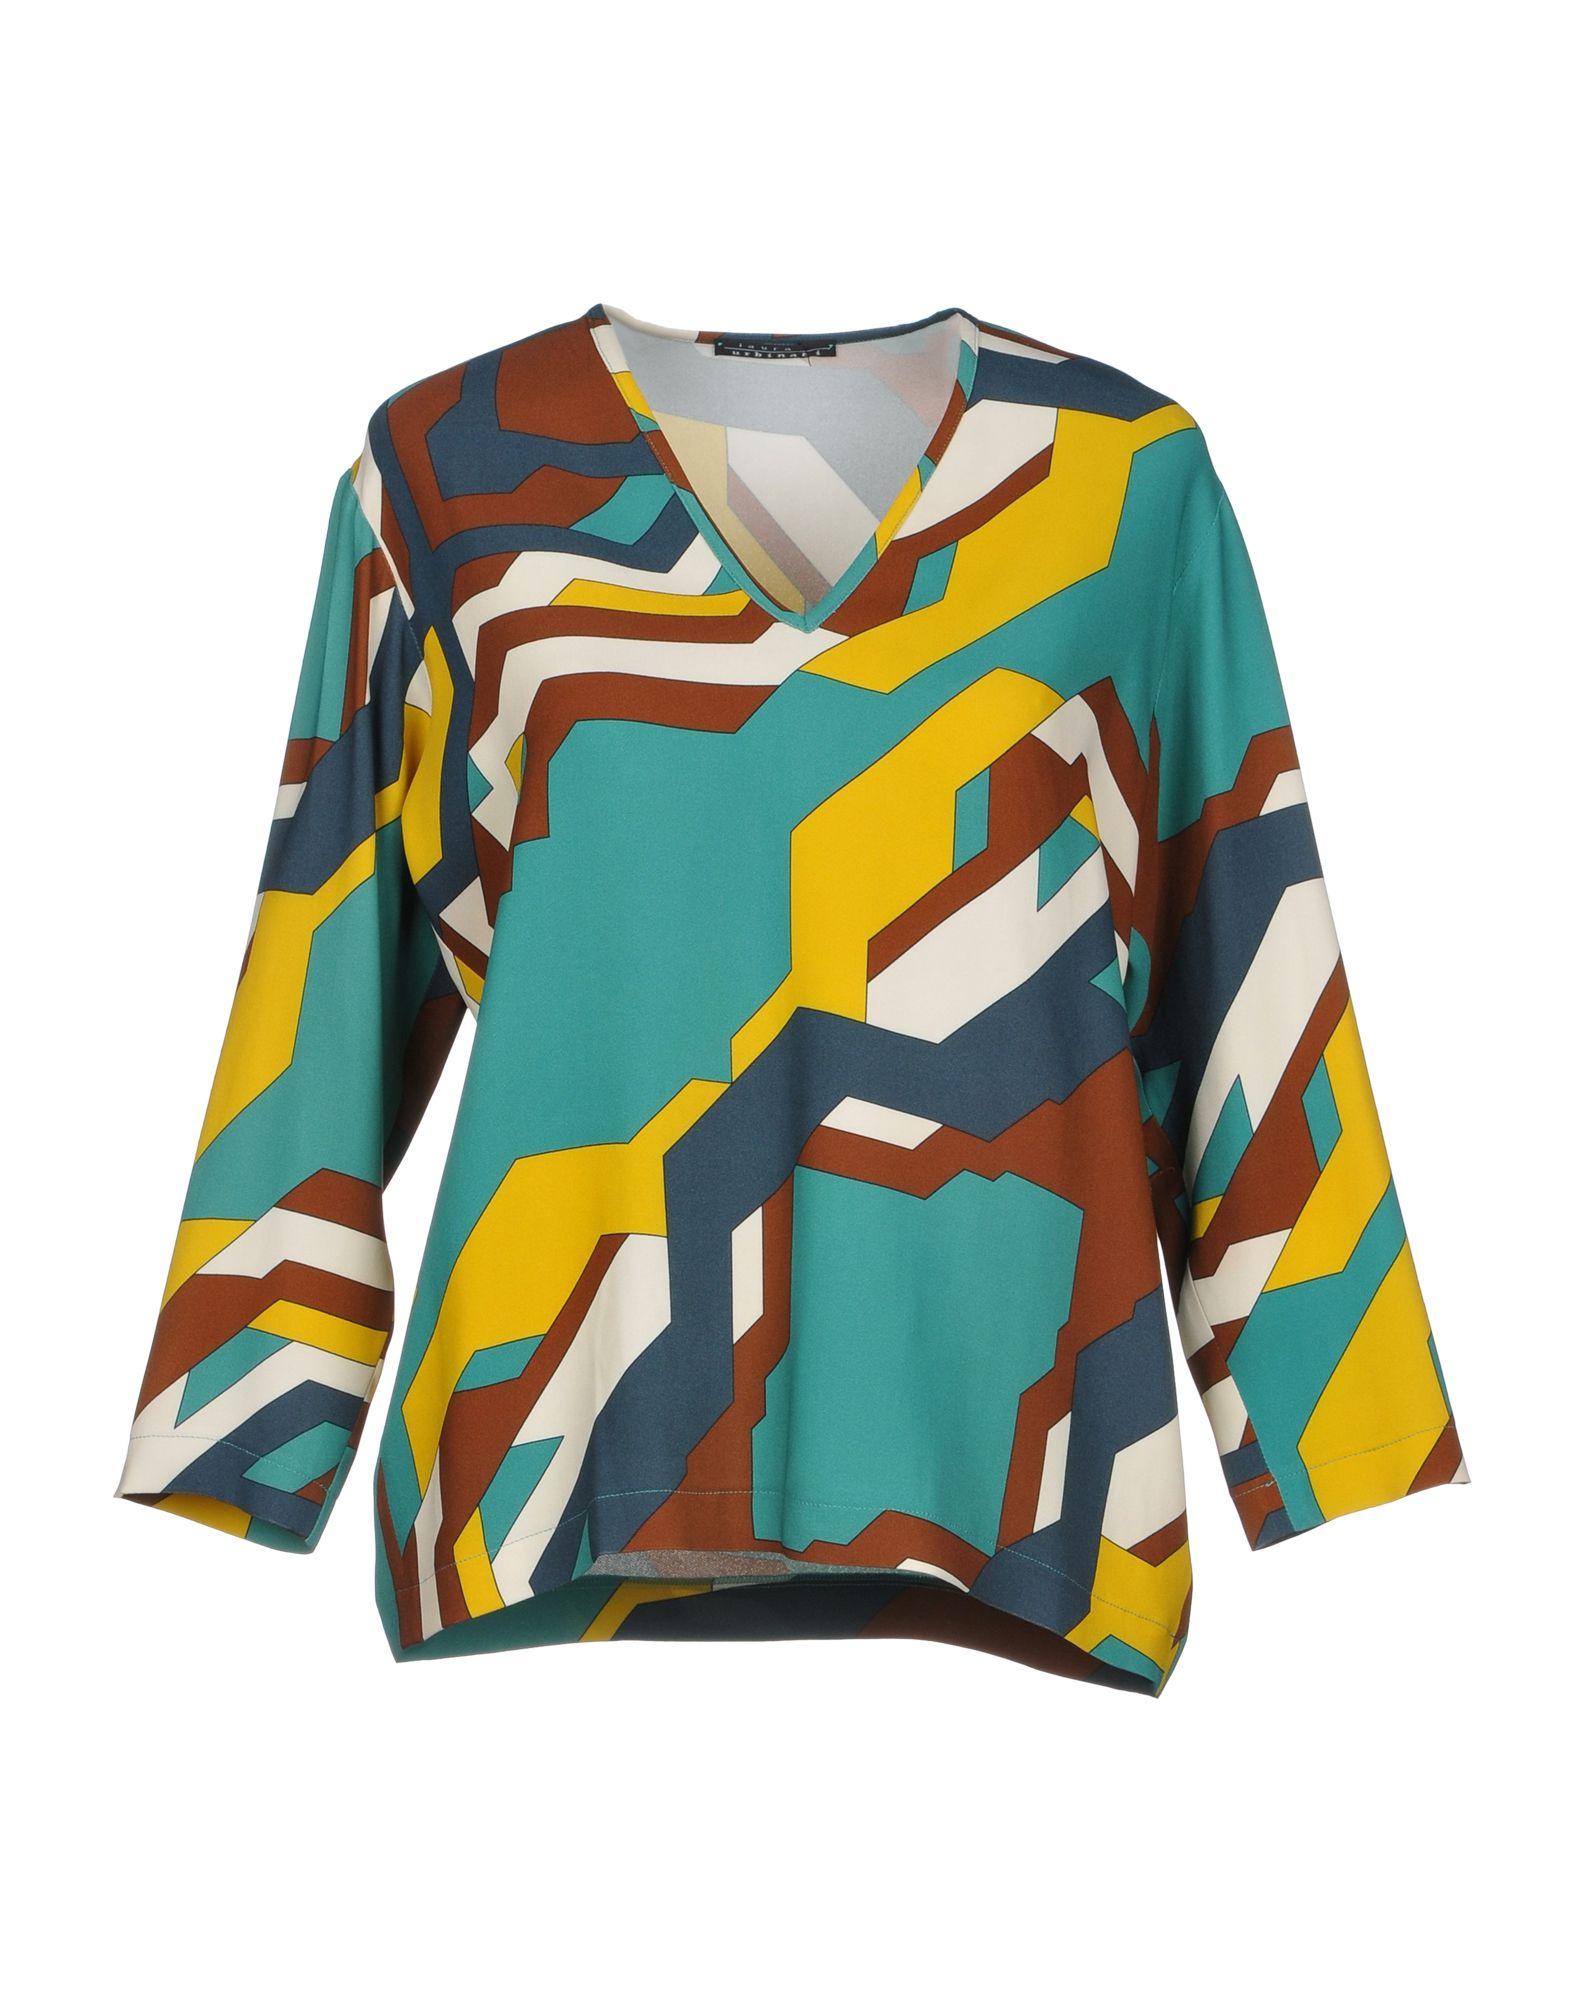 LAURA URBINATI Блузка блузка laura kent klingel цвет серый коралловый рисунок